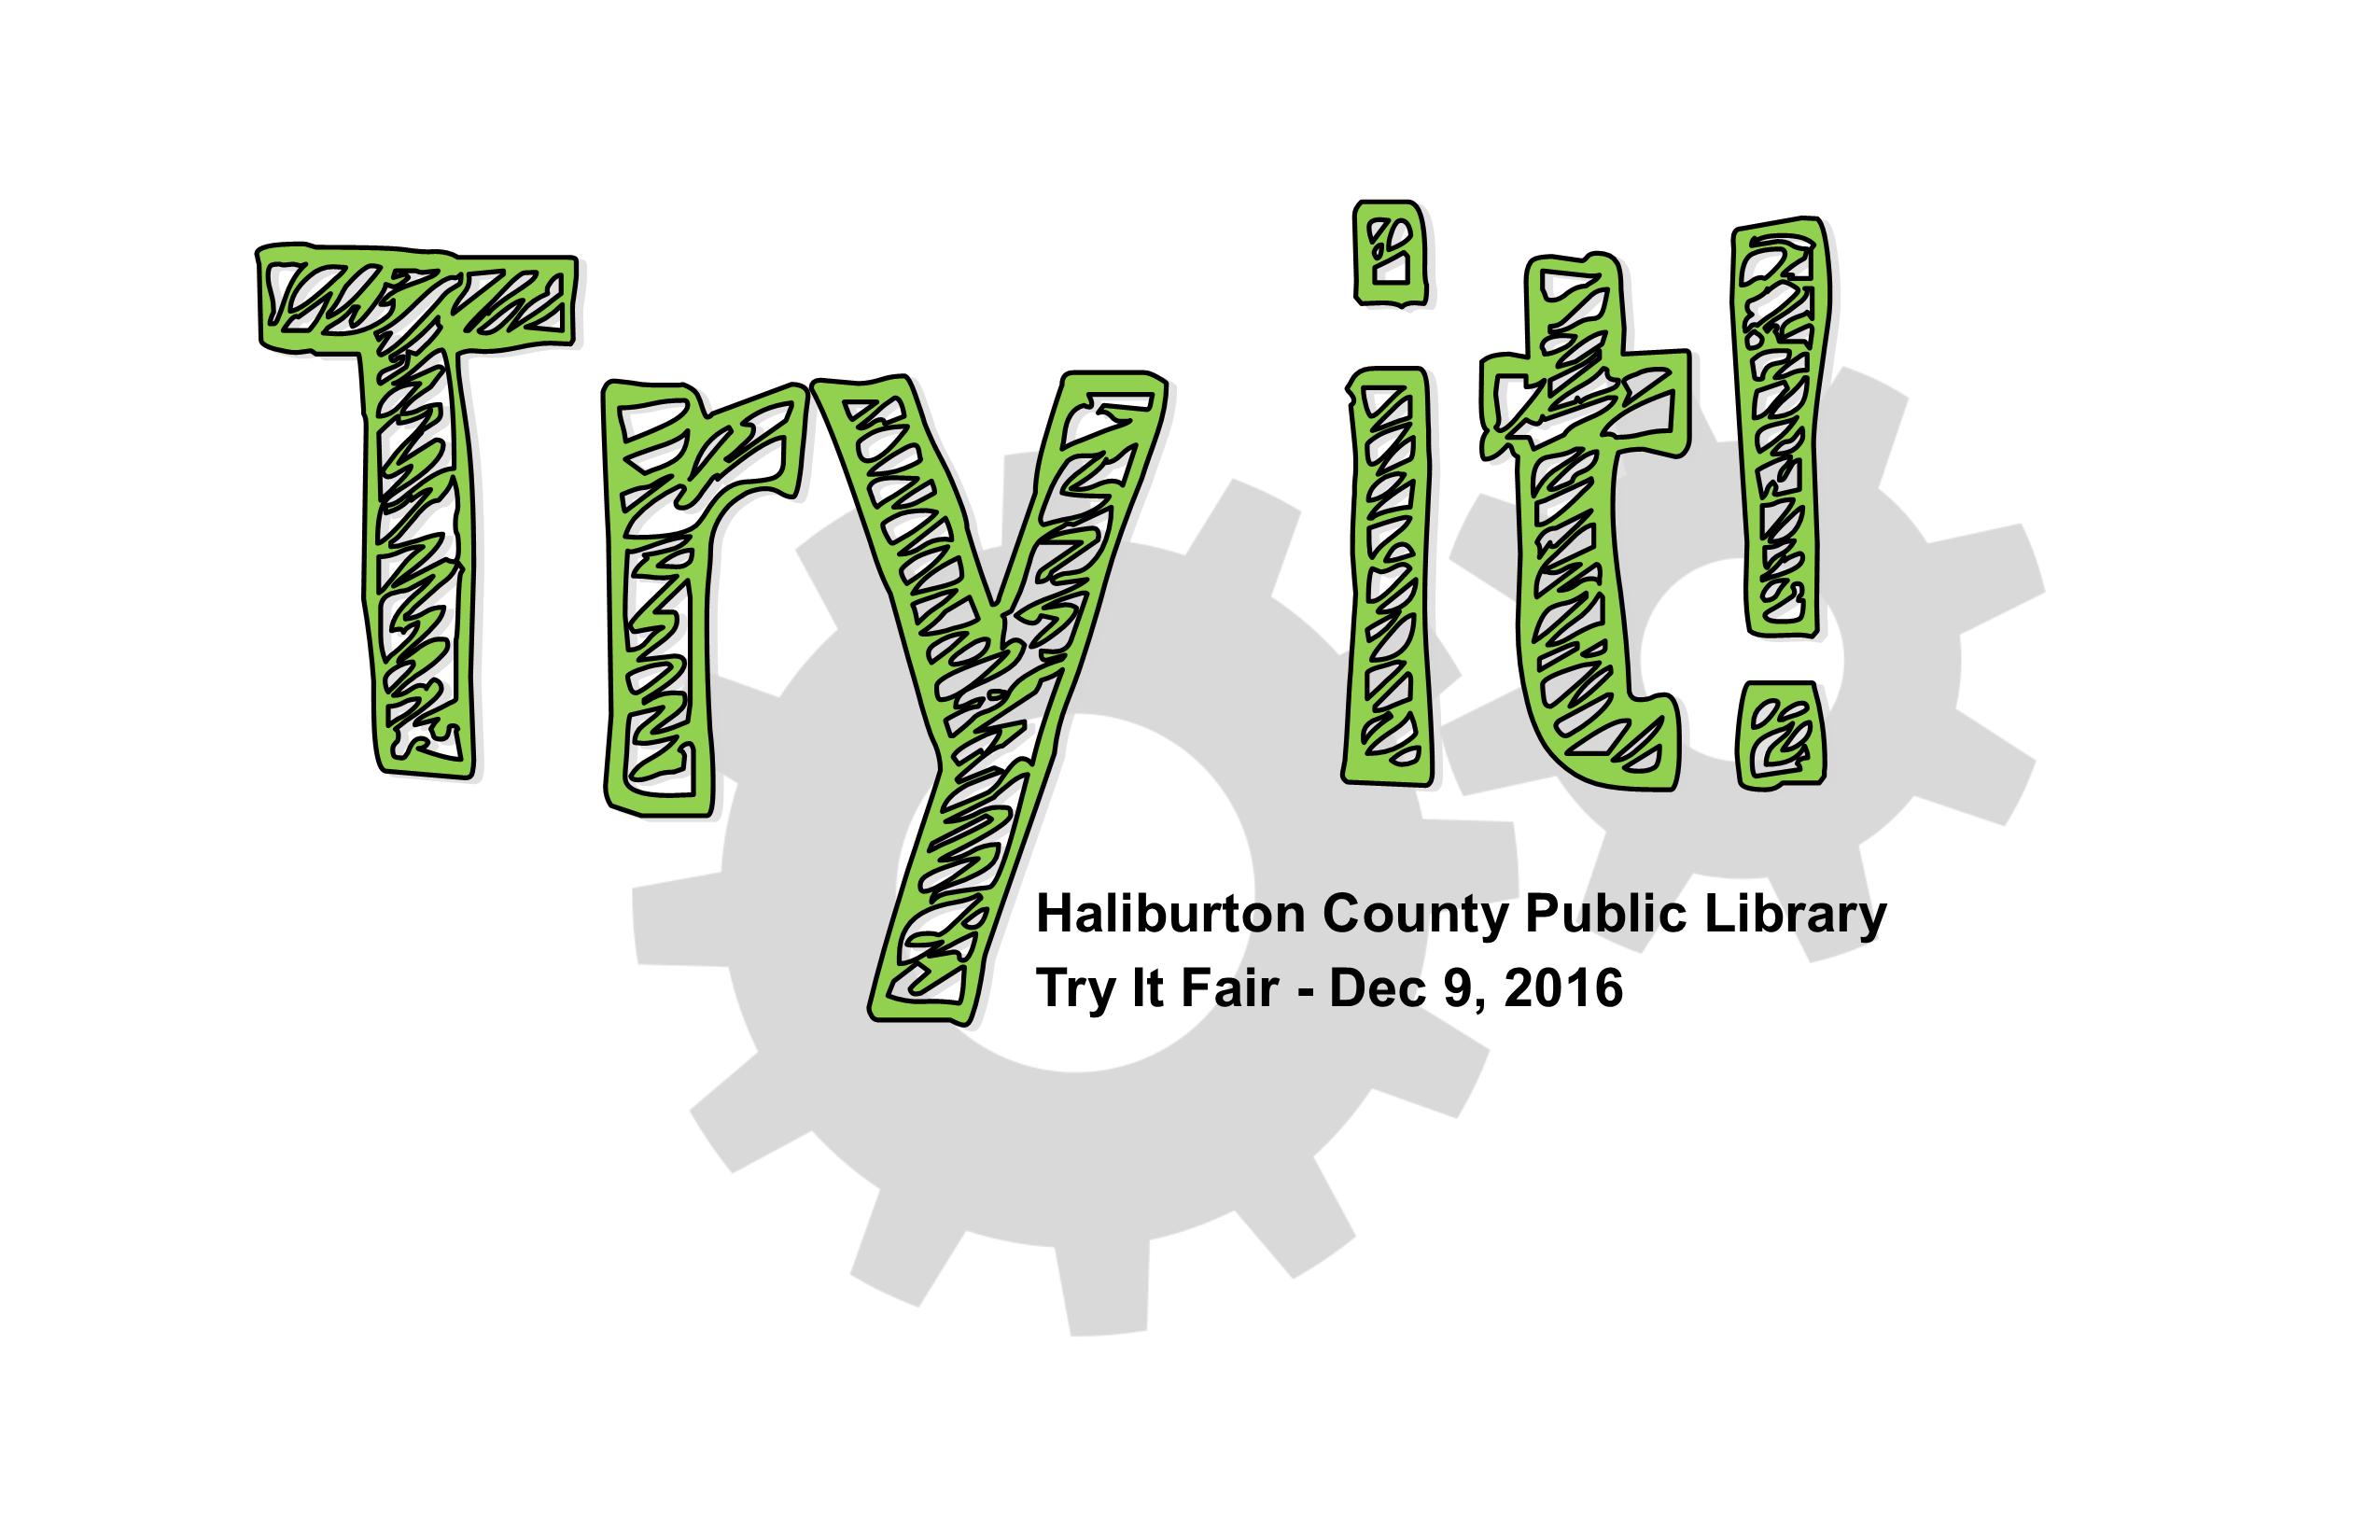 Try it fair logo